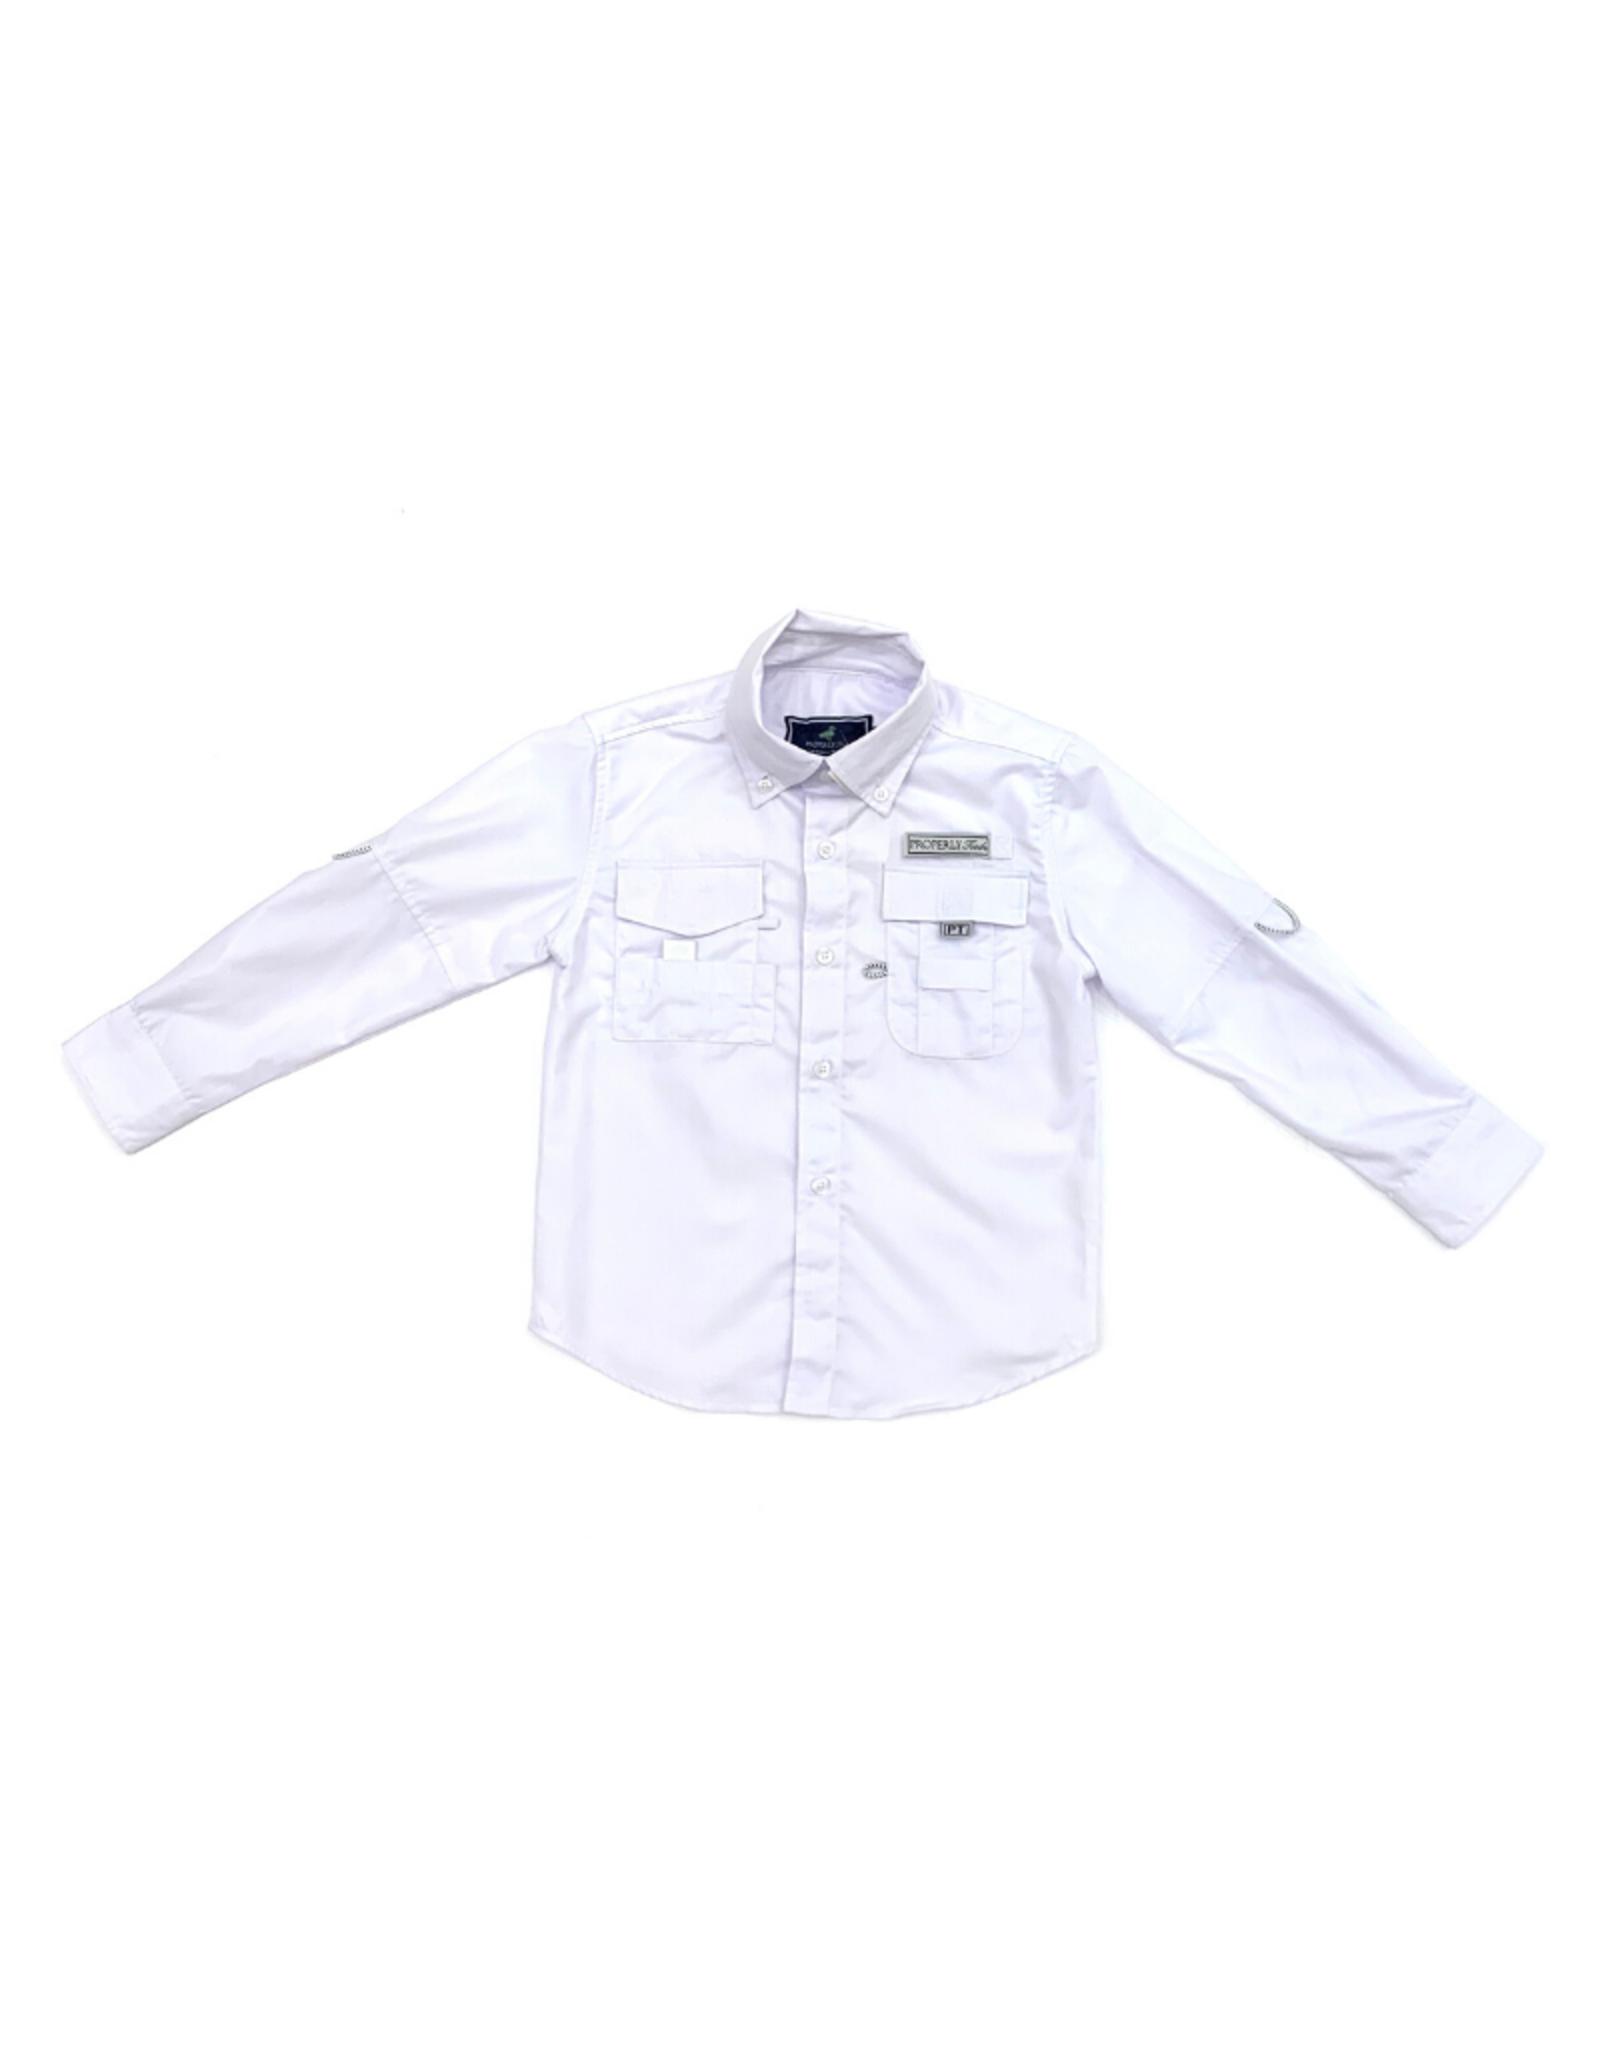 Properly Tied Polar White Fishing Shirt